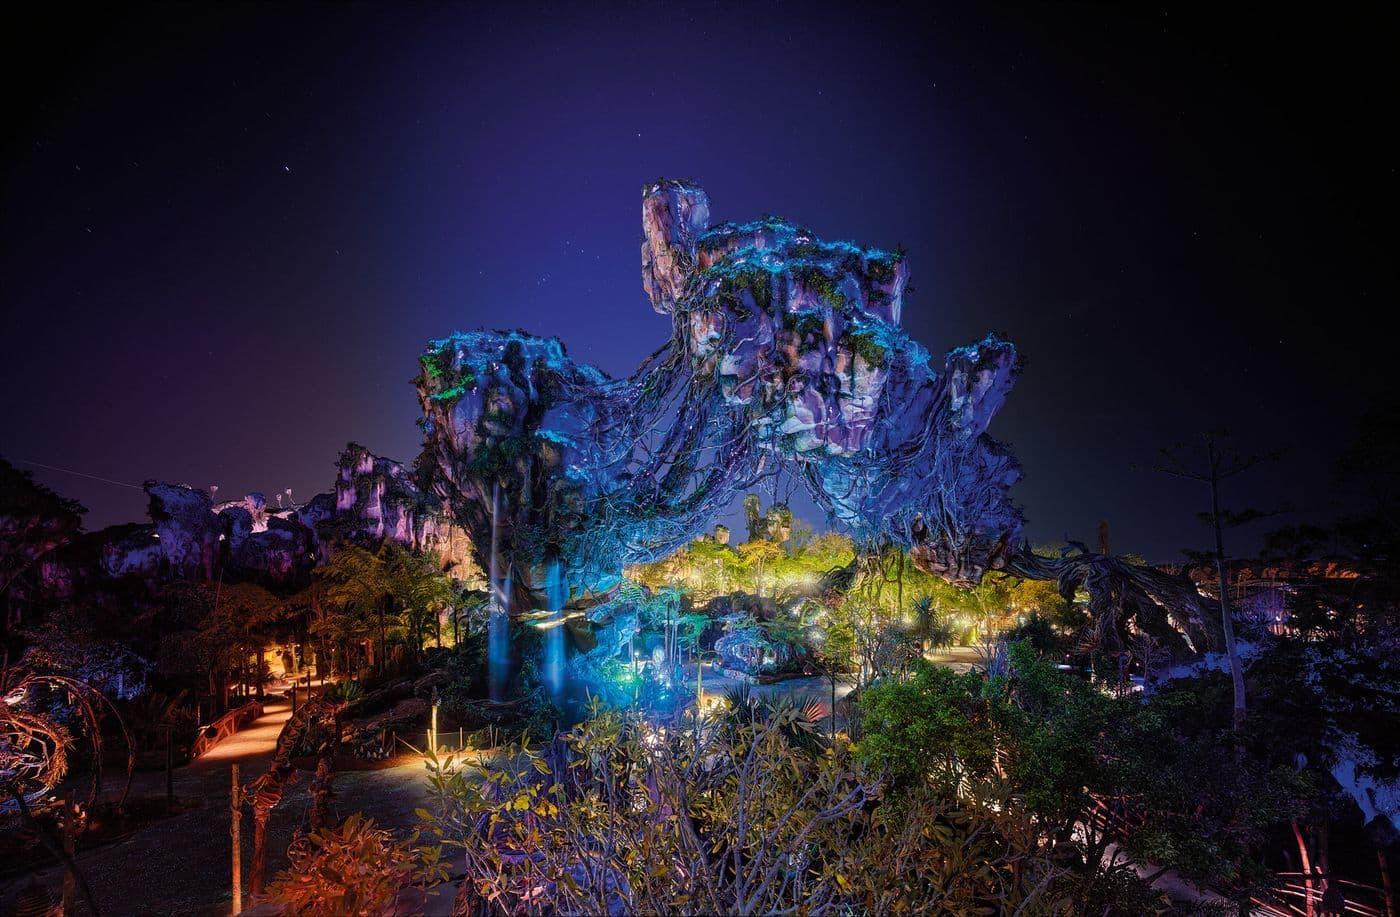 New nighttime photos of Pandora: The World of Avatar light up the night